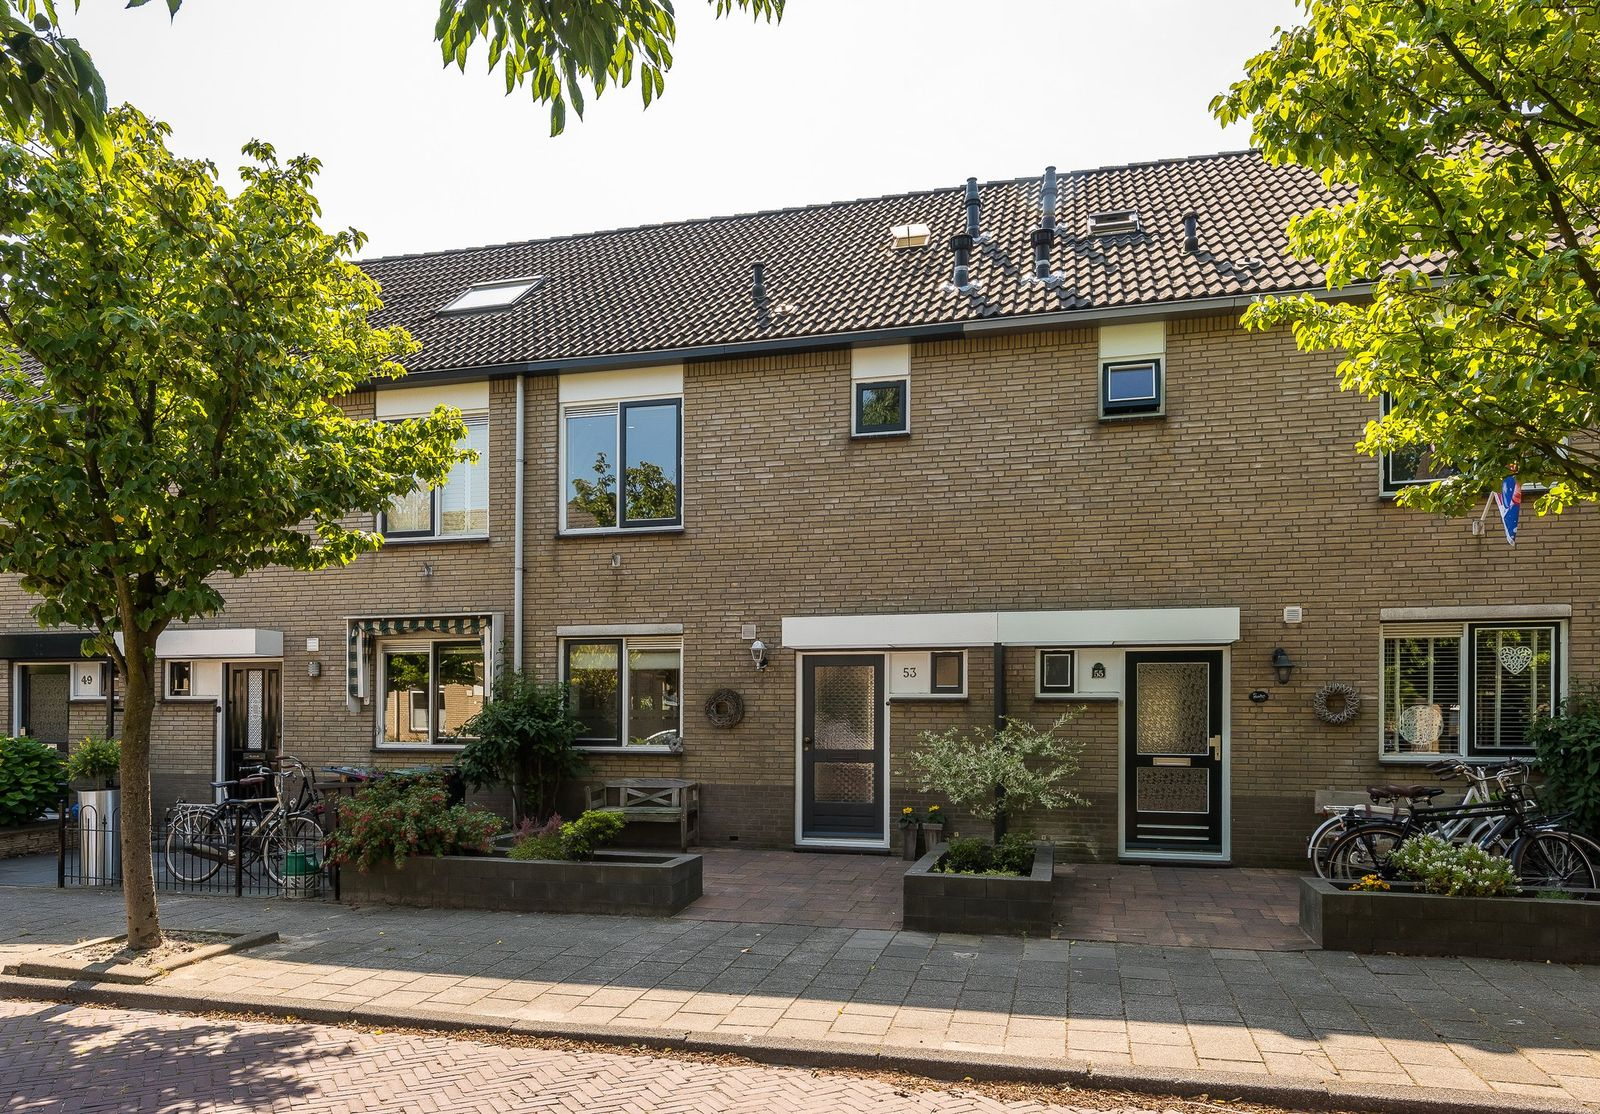 Uilehorst 53, Honselersdijk